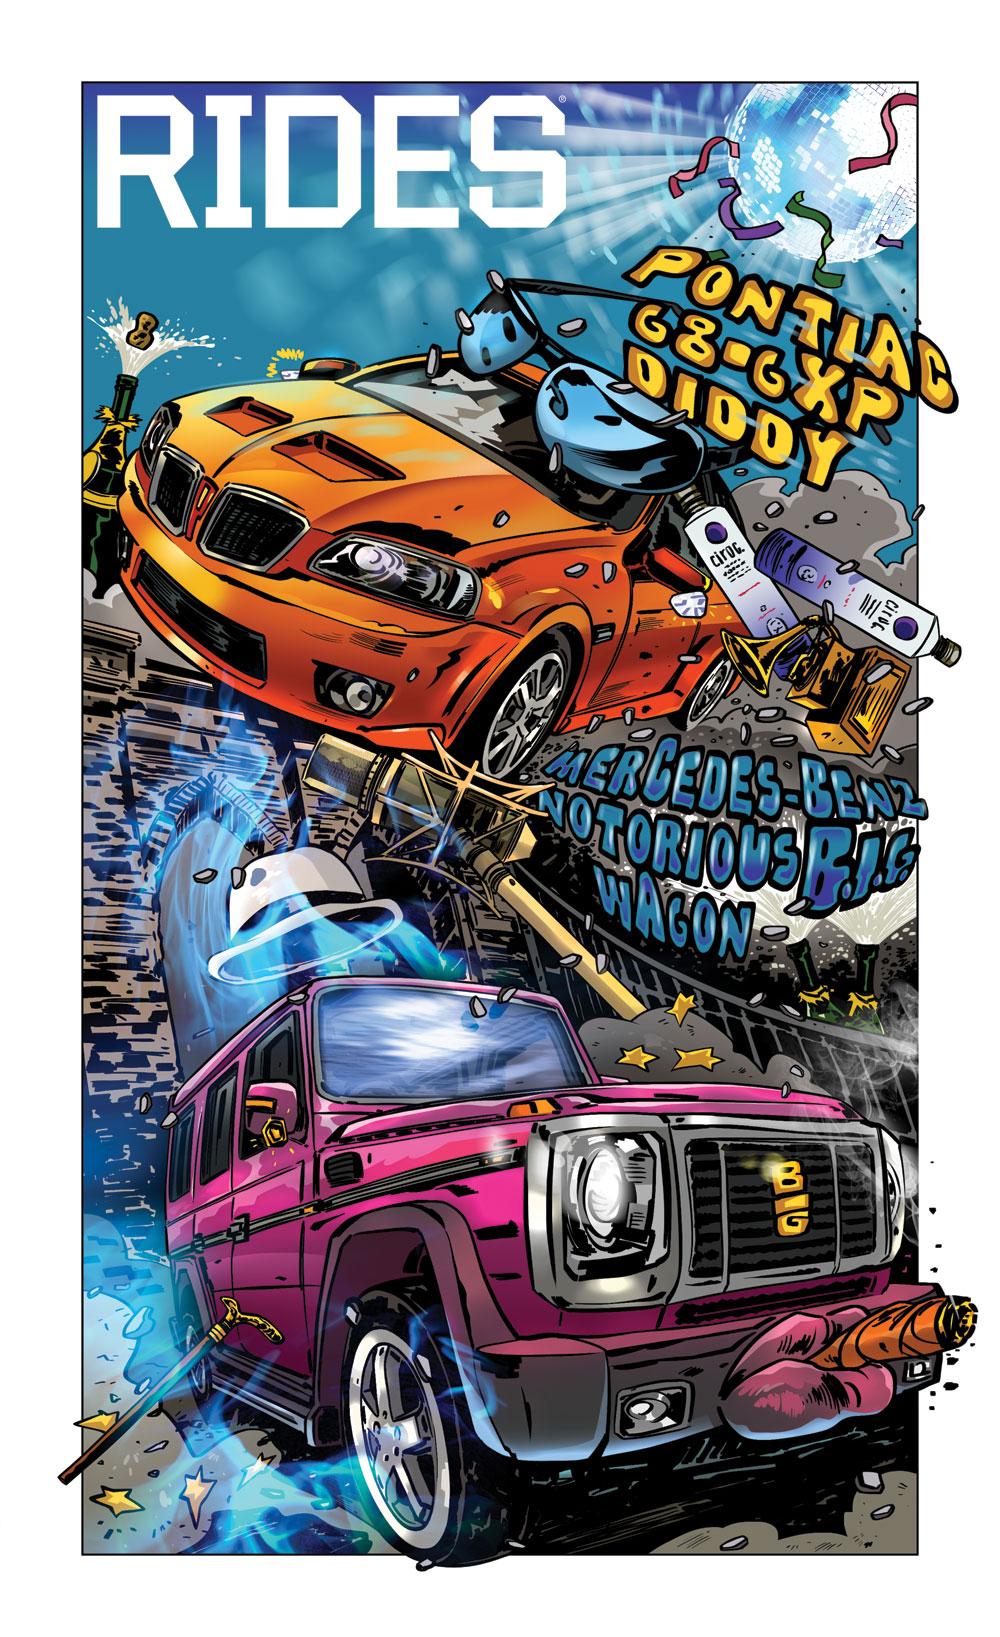 rides cars mash box car toons p.diddy pontiac g8 gxp notorious b.i.g. biggie g-wagon mercedes-benz Tin Salamunic